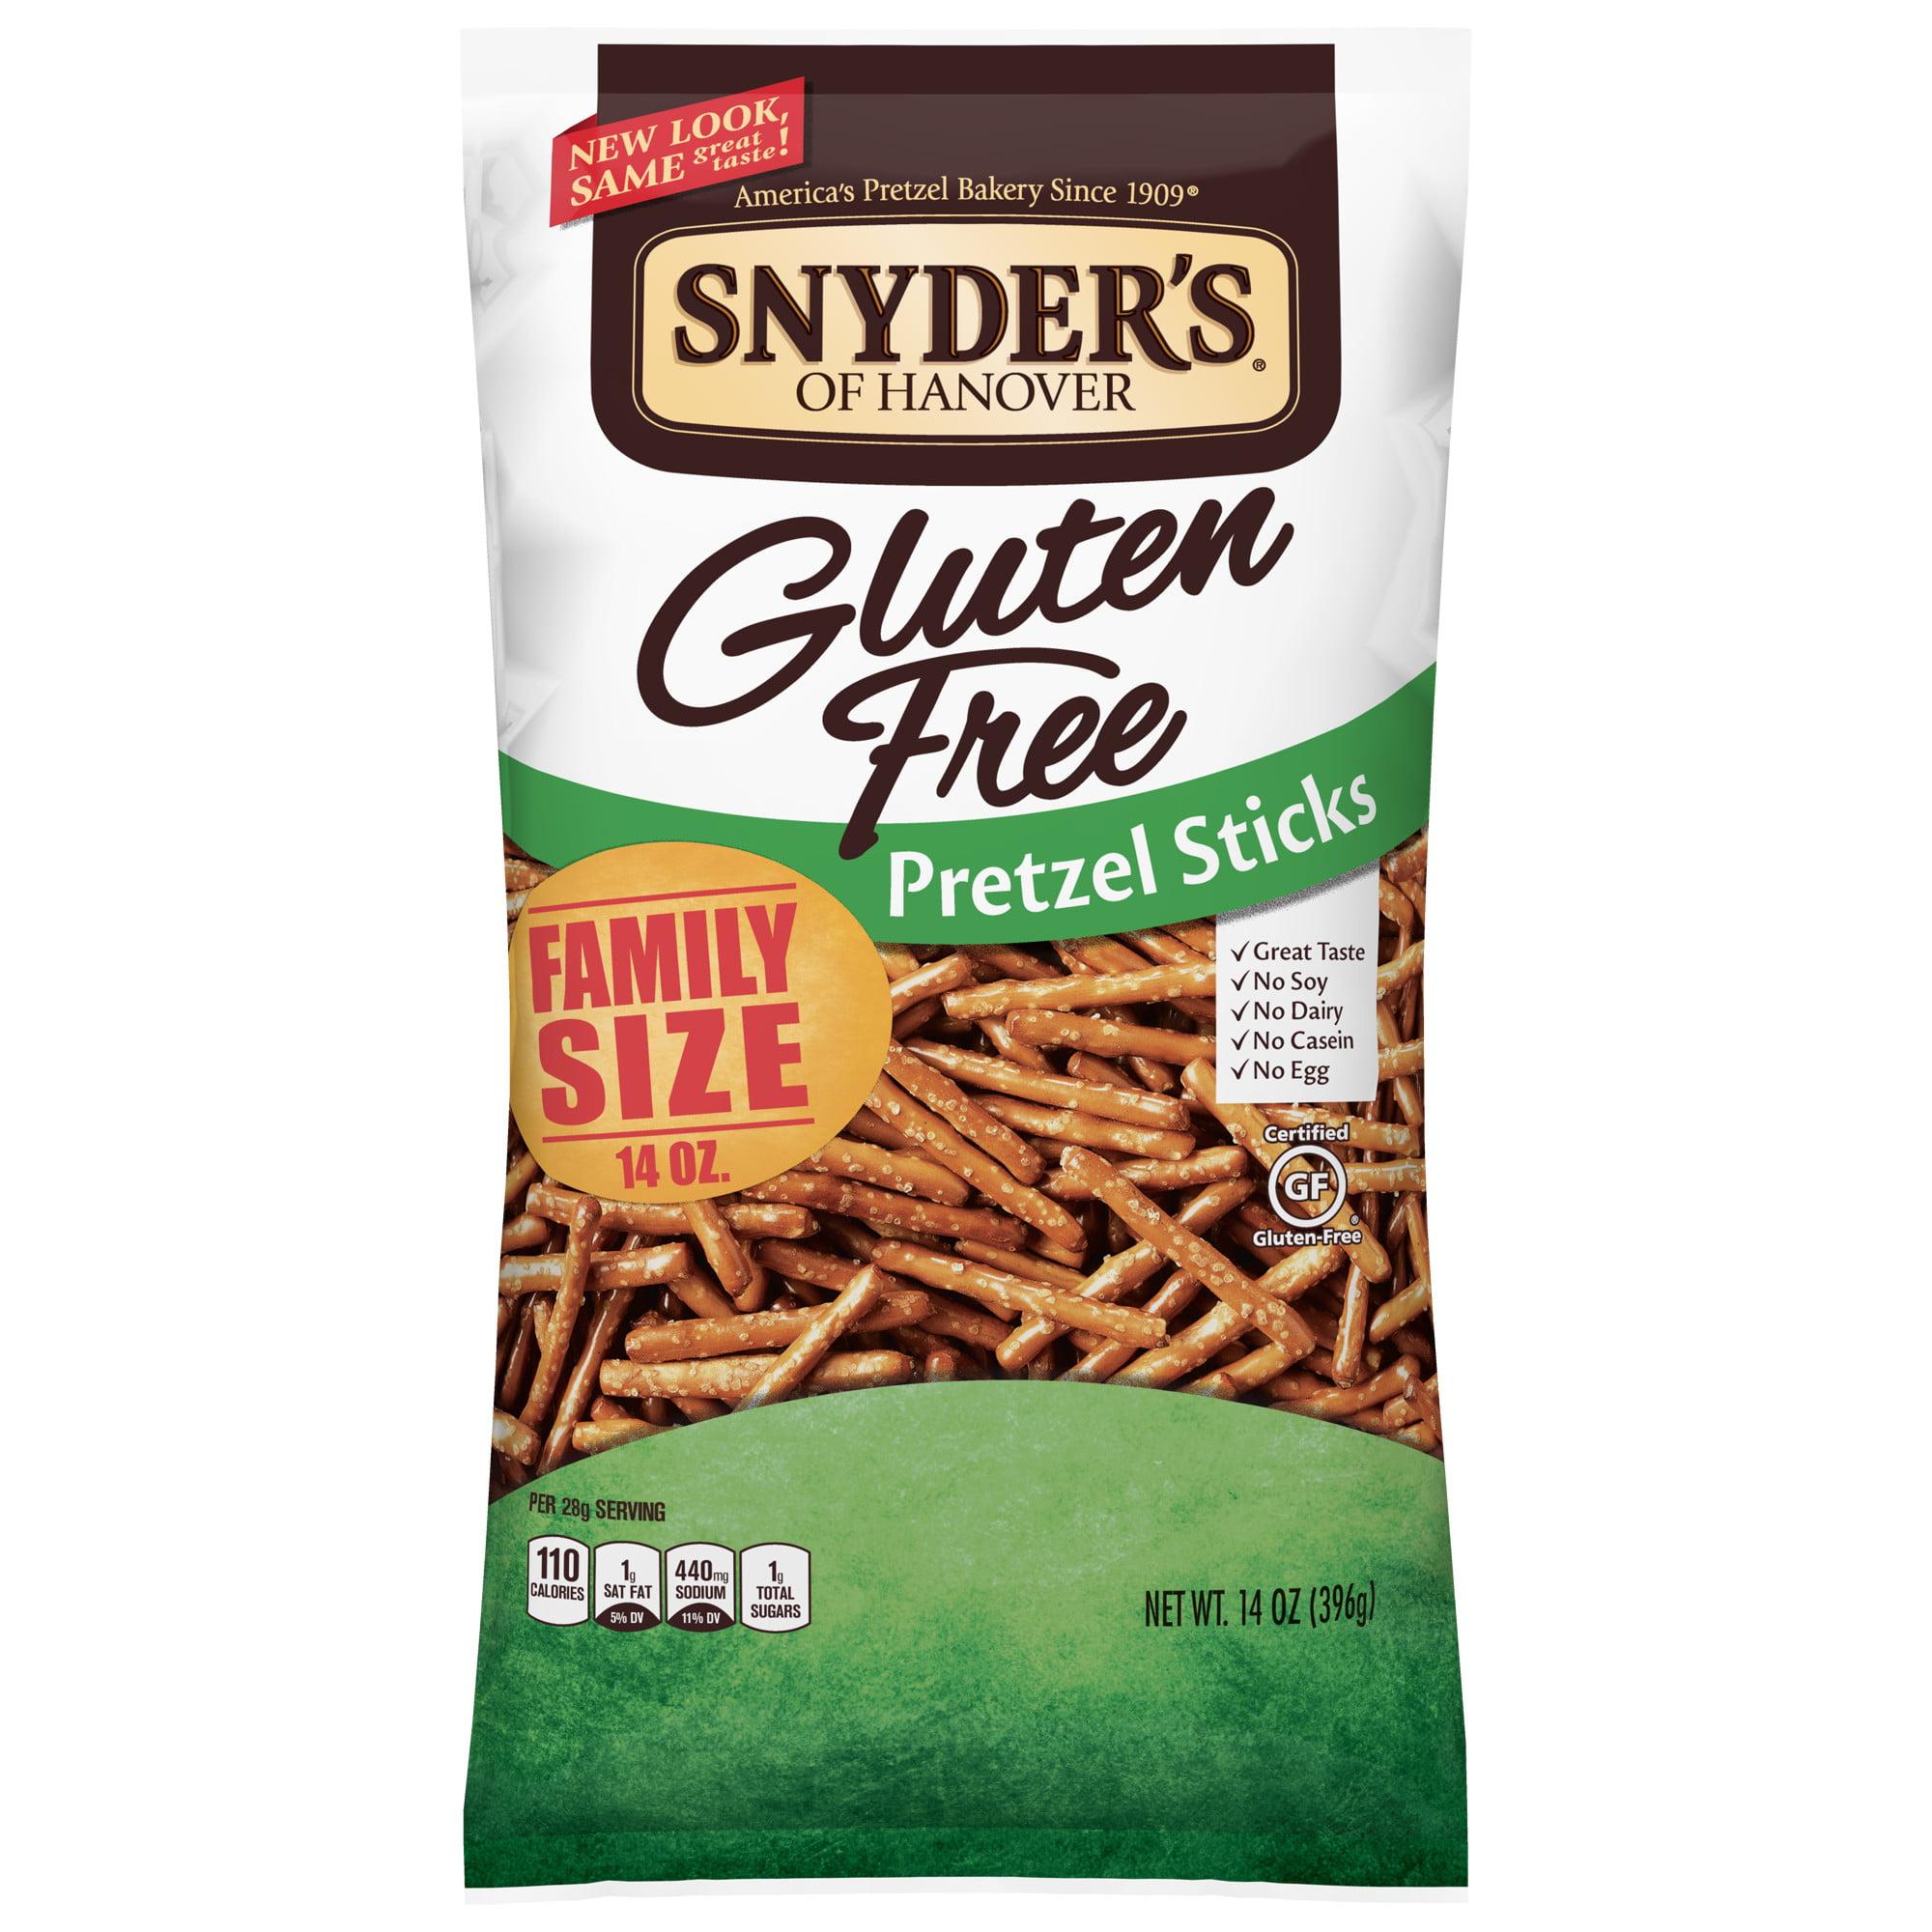 (4 Pack) Snyder's of Hanover Gluten Free Pretzel Sticks Family Size, 14.0 Oz